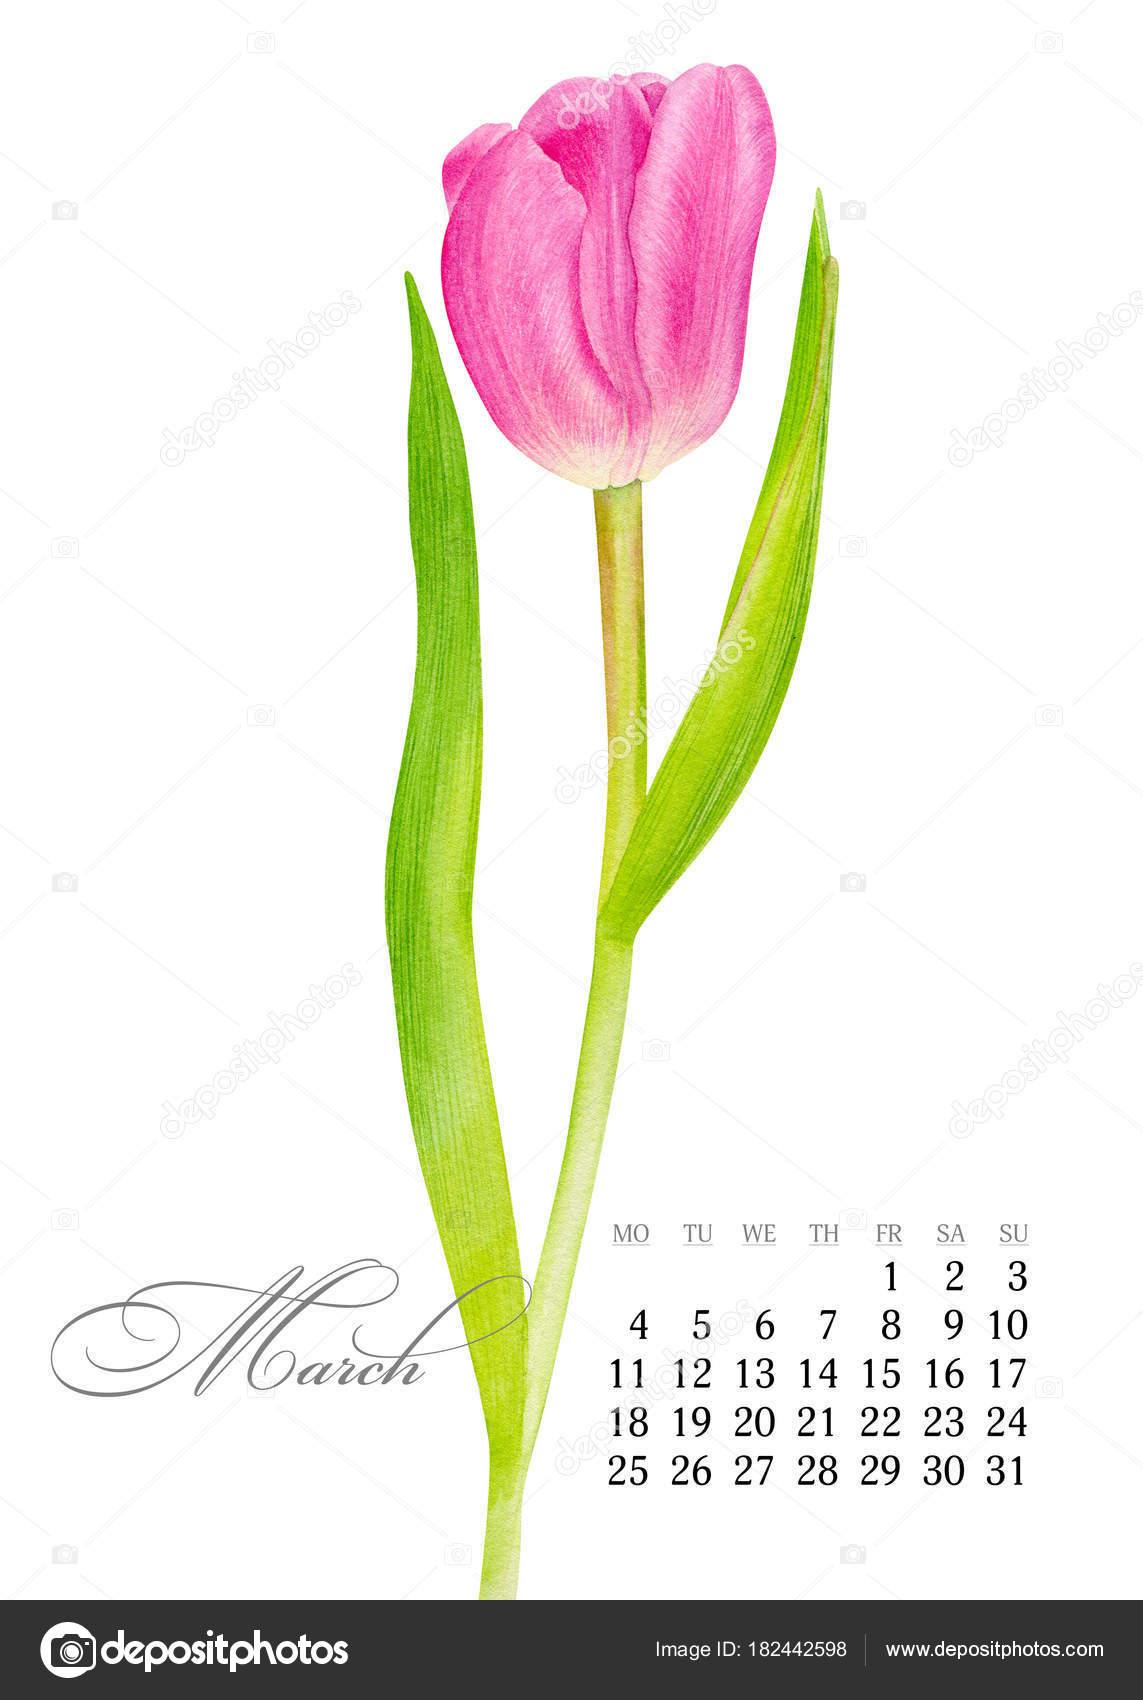 photo regarding Tulip Template Printable identified as Tulip routine printable Sophisticated printable calendar 2019